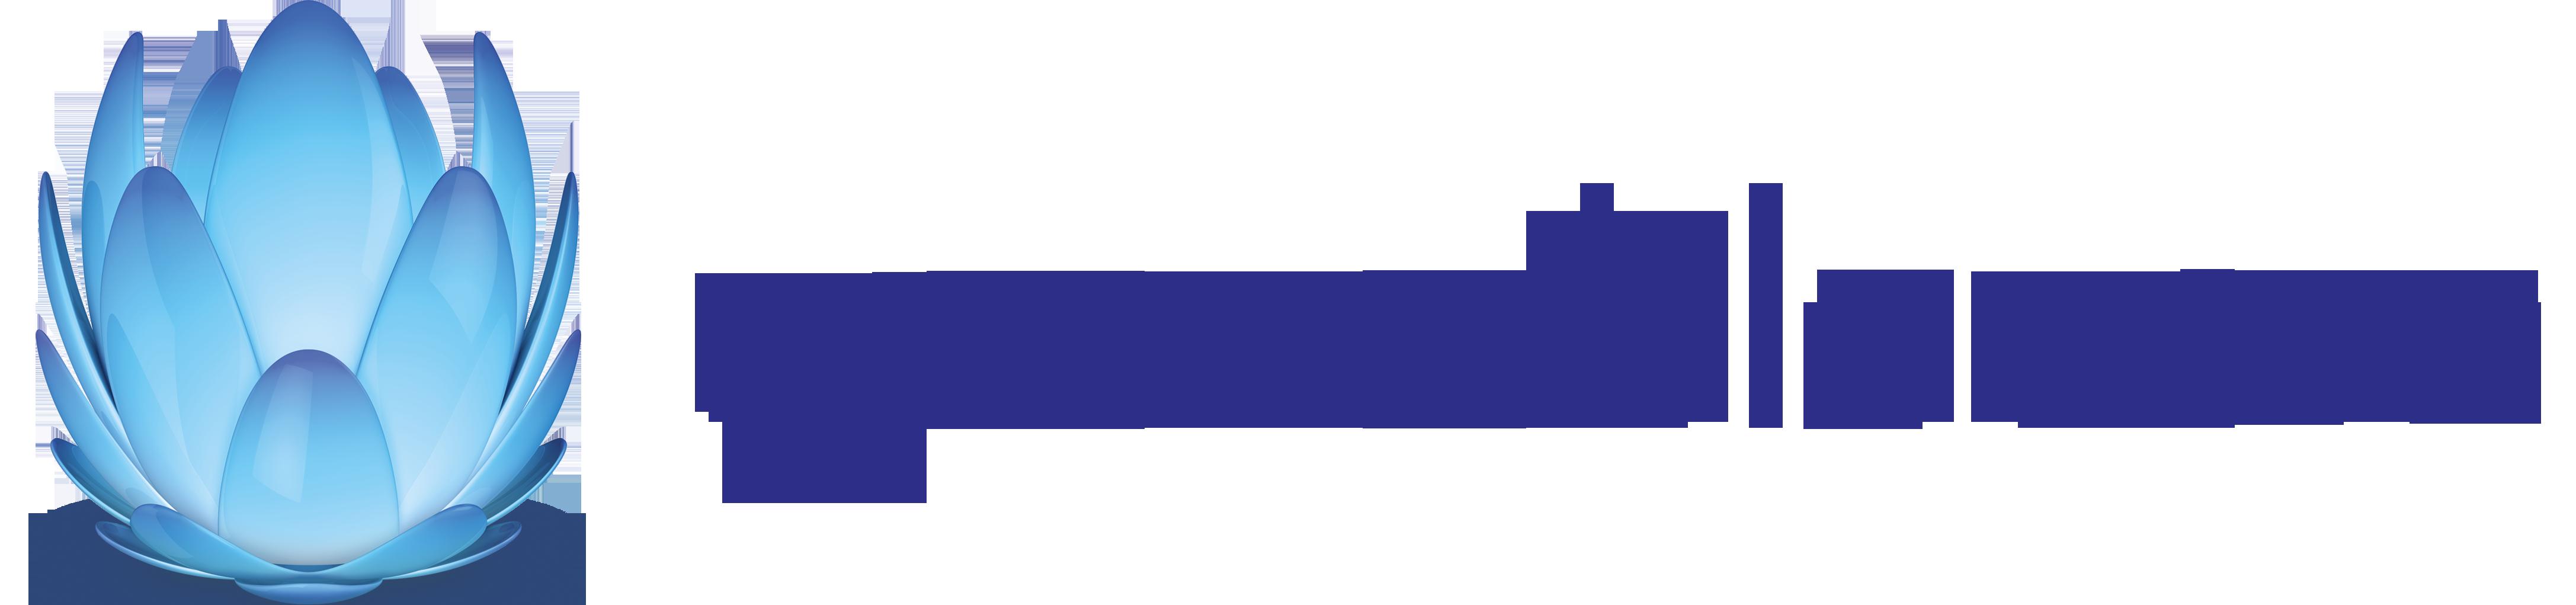 UPC_cablecom_Bancadati